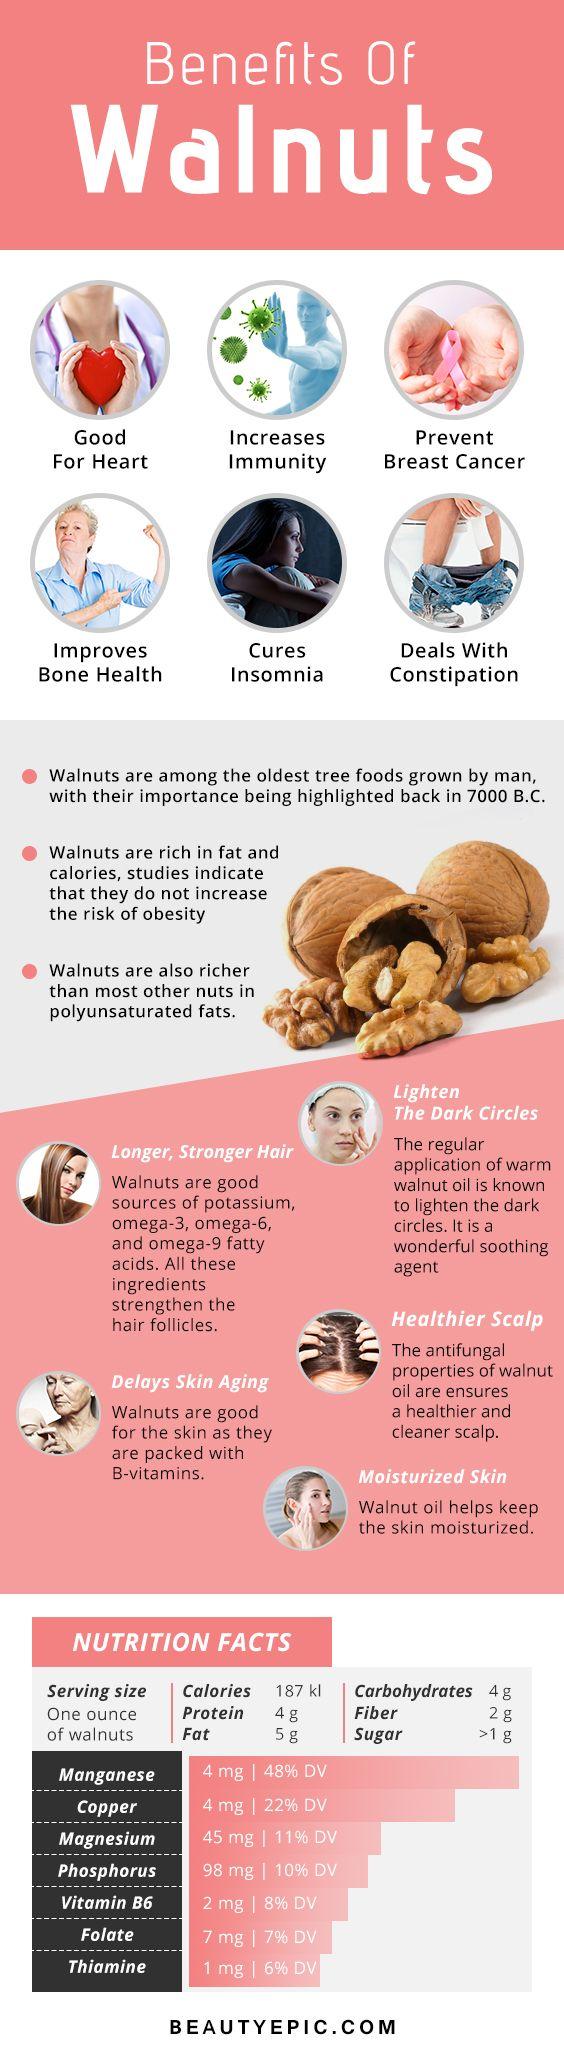 16 Amazing Health Benefits of Walnuts